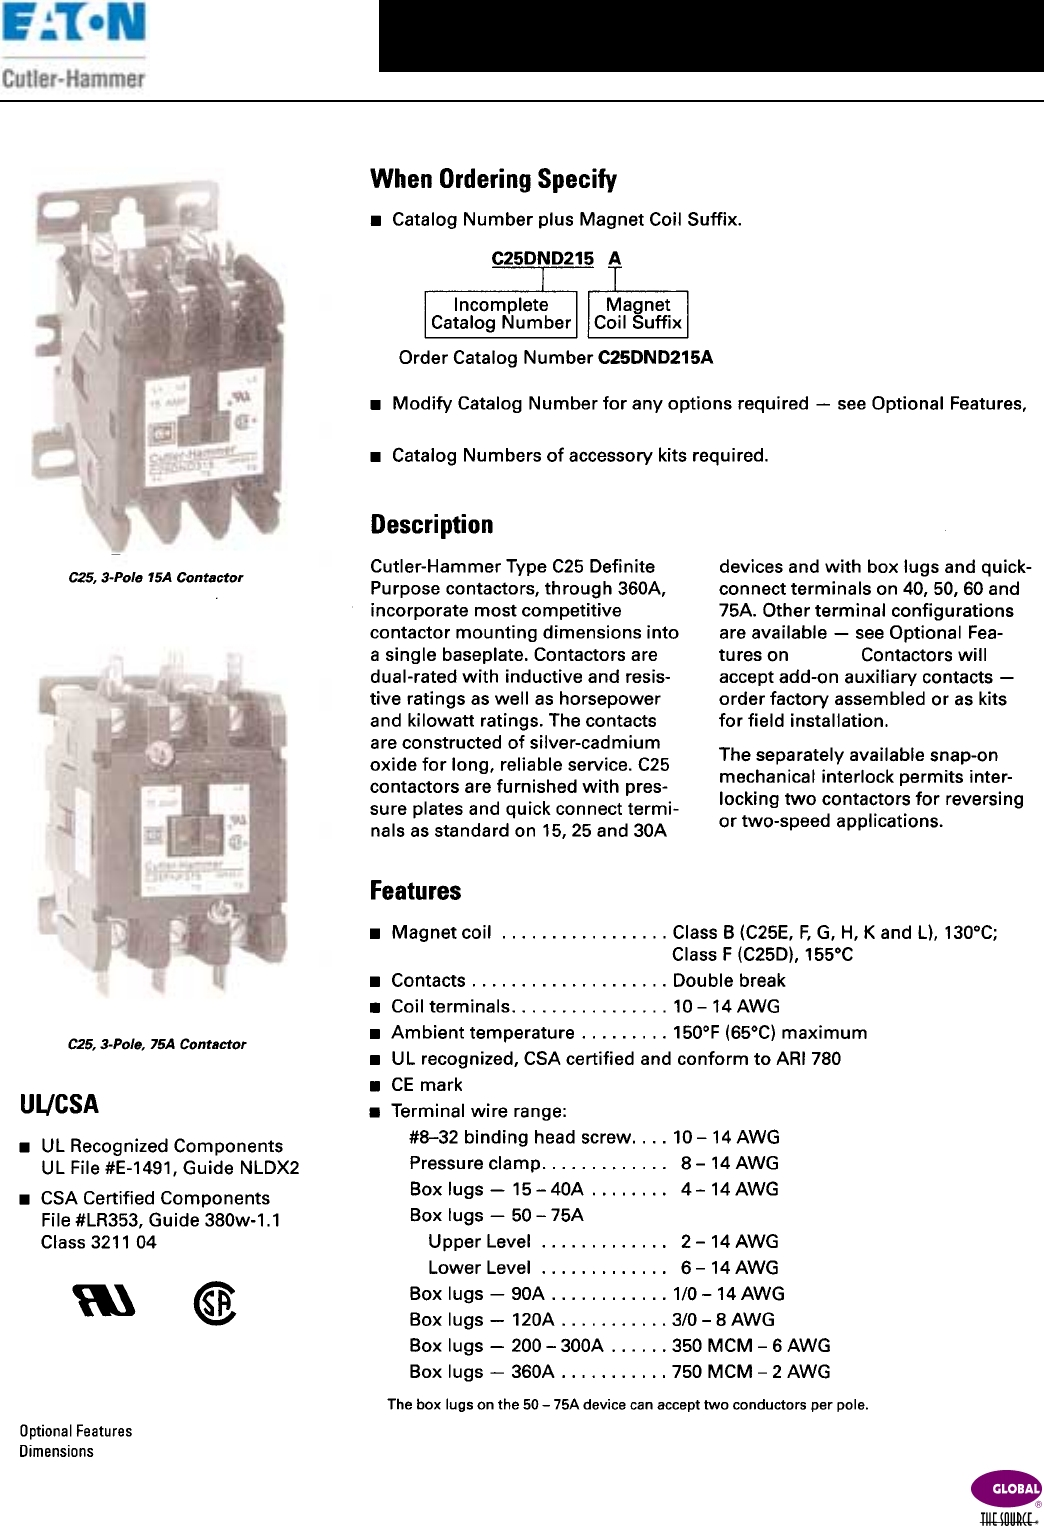 Icm254 Wiring Diagram